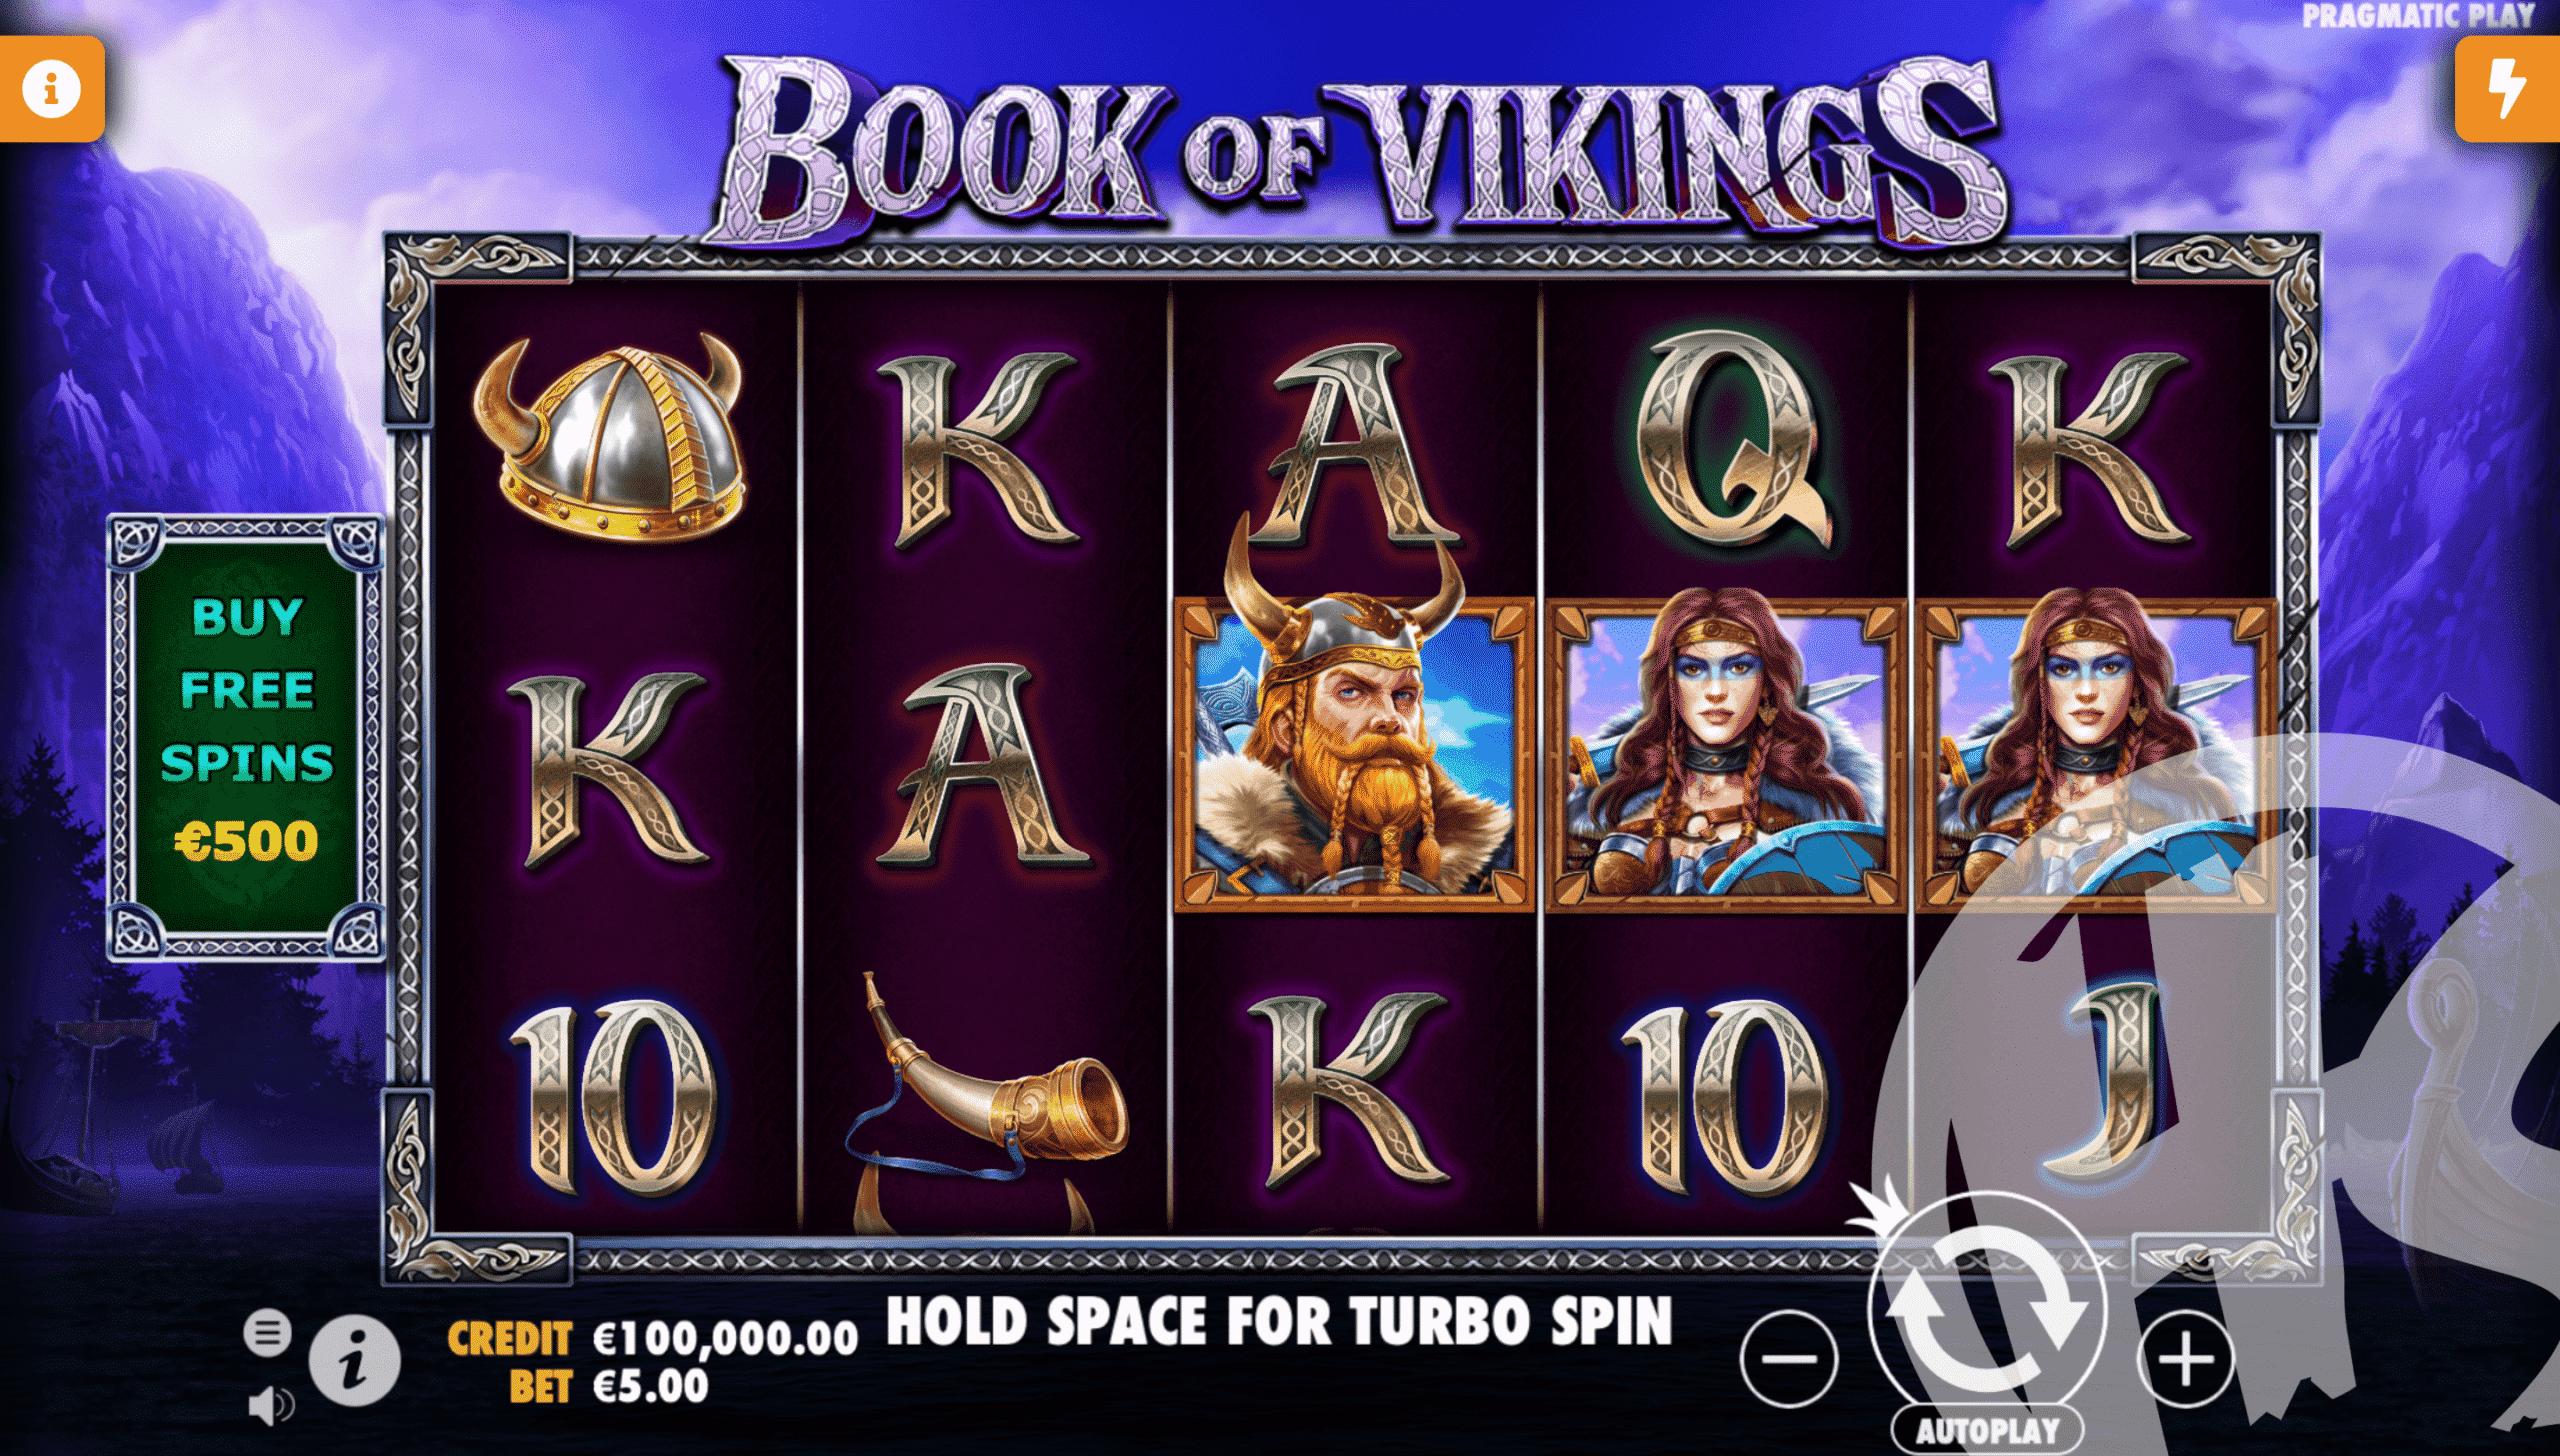 Book of Vikings Base Game